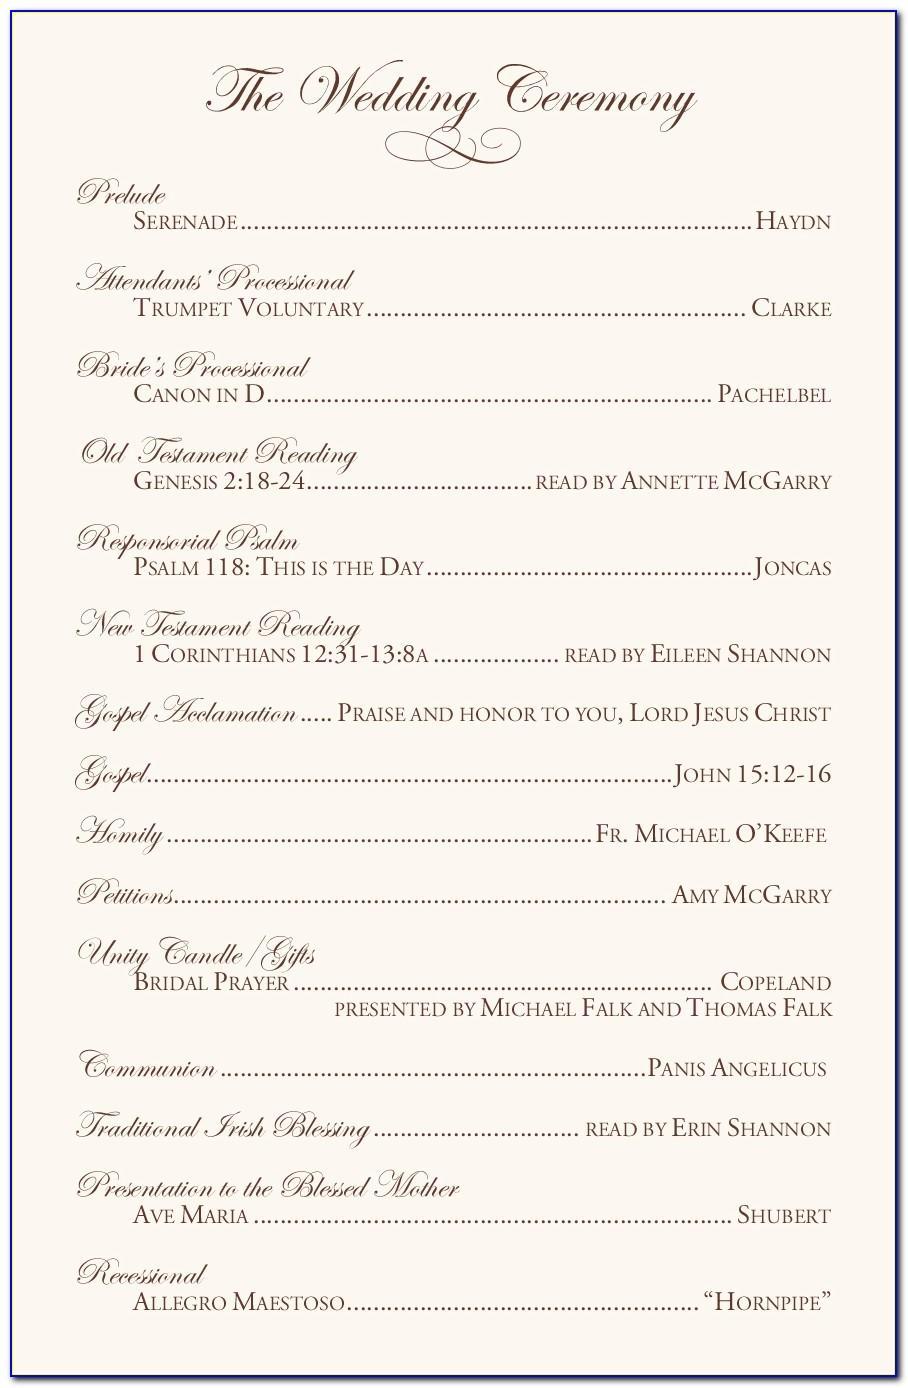 Catholic Wedding Program Template With Mass